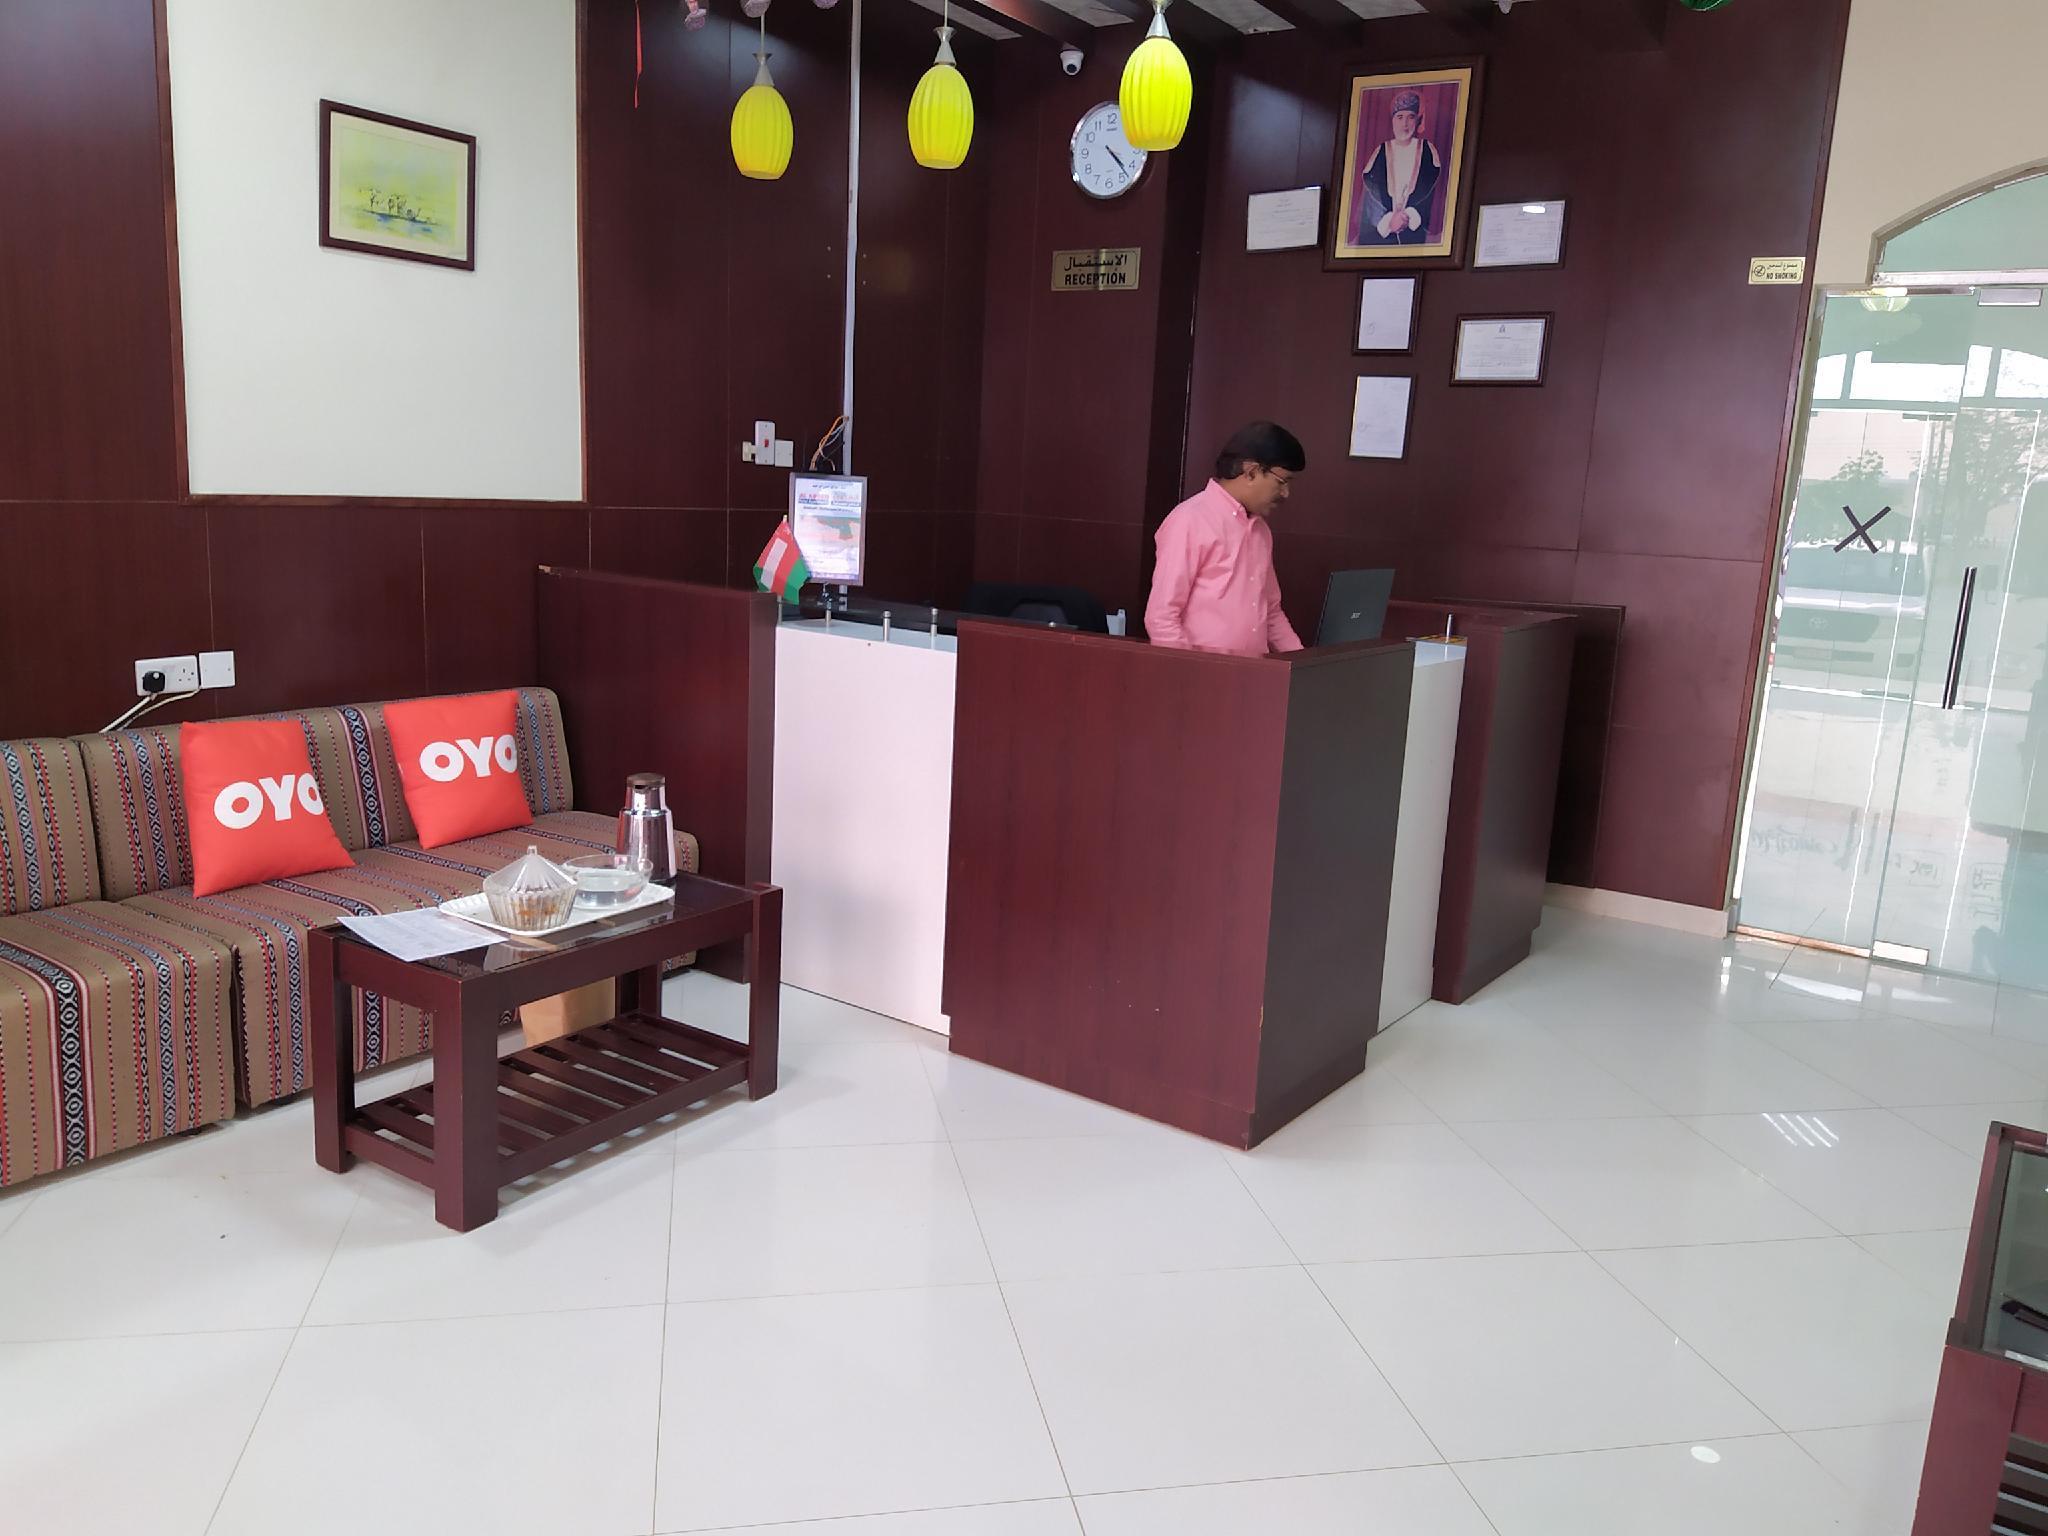 Al Areen Hotel Apartment Bidiyah, Biddiya